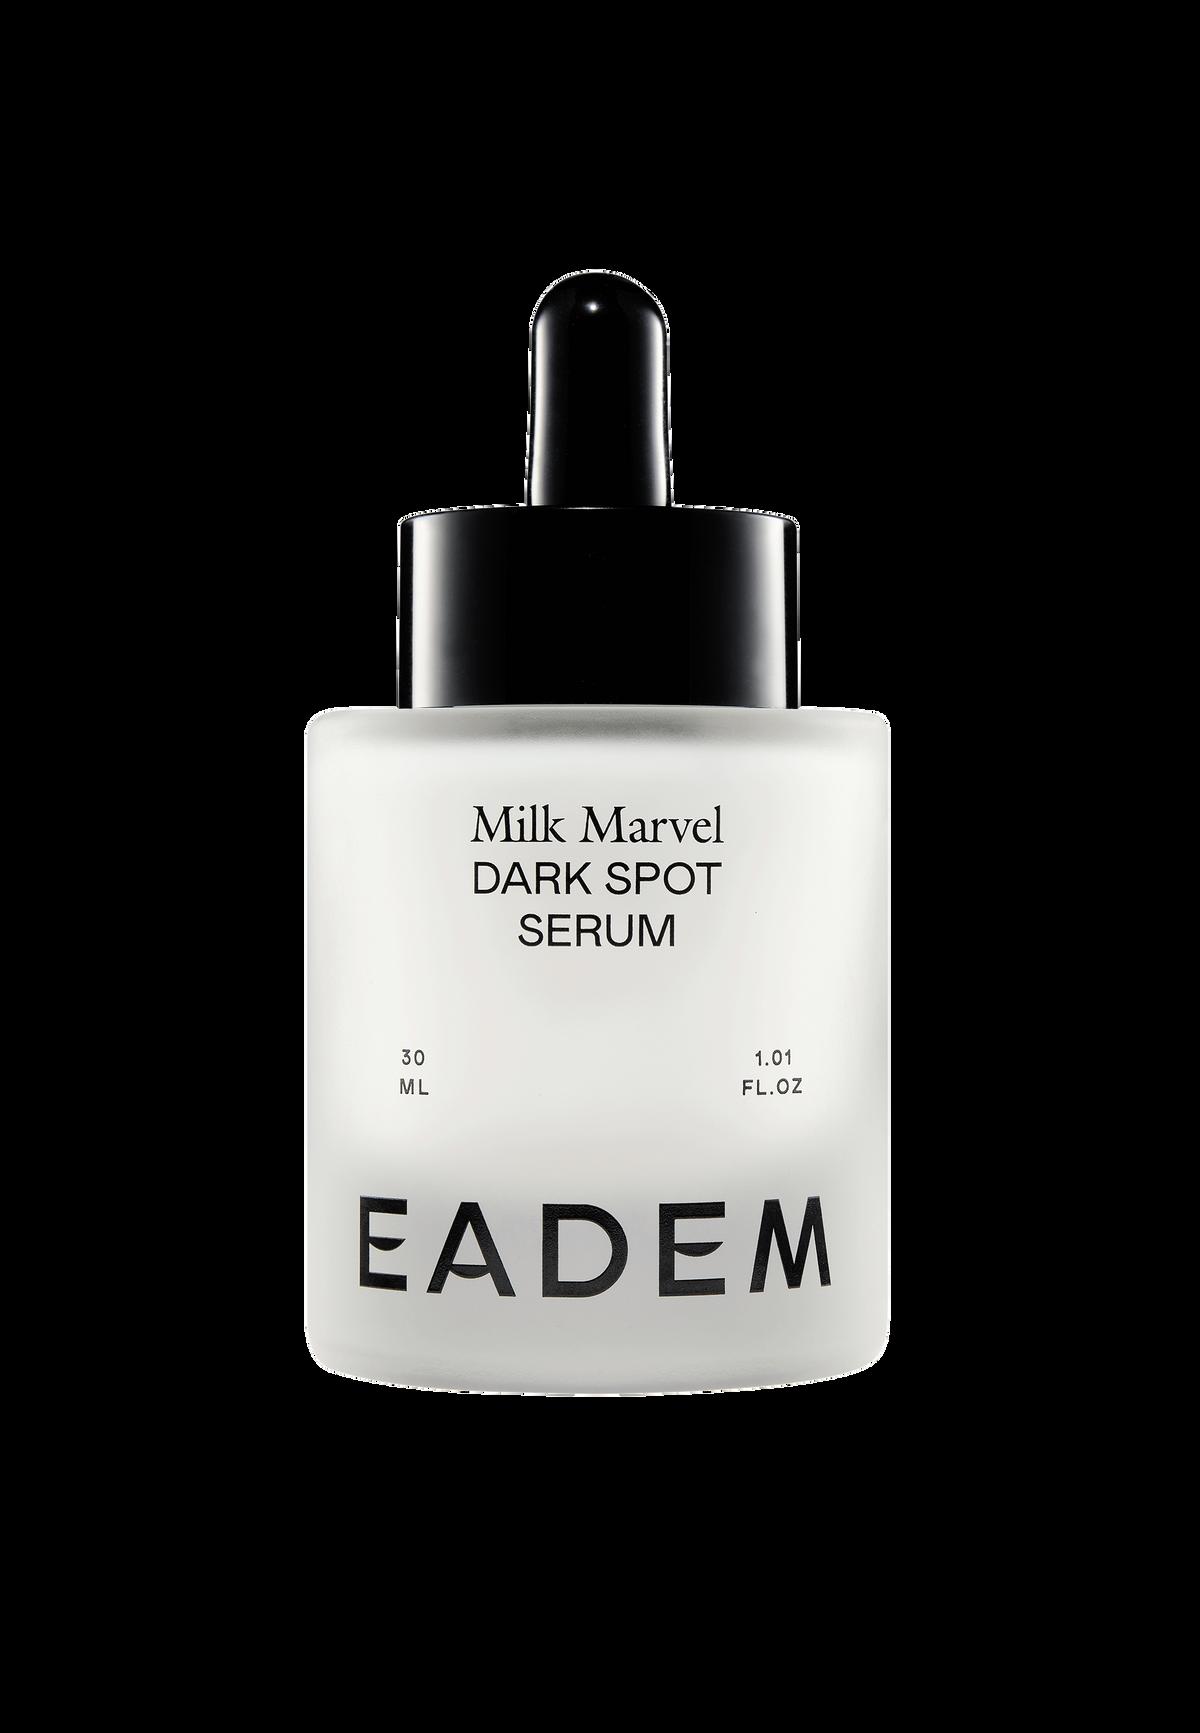 Milk Marvel Dark Spot Serum